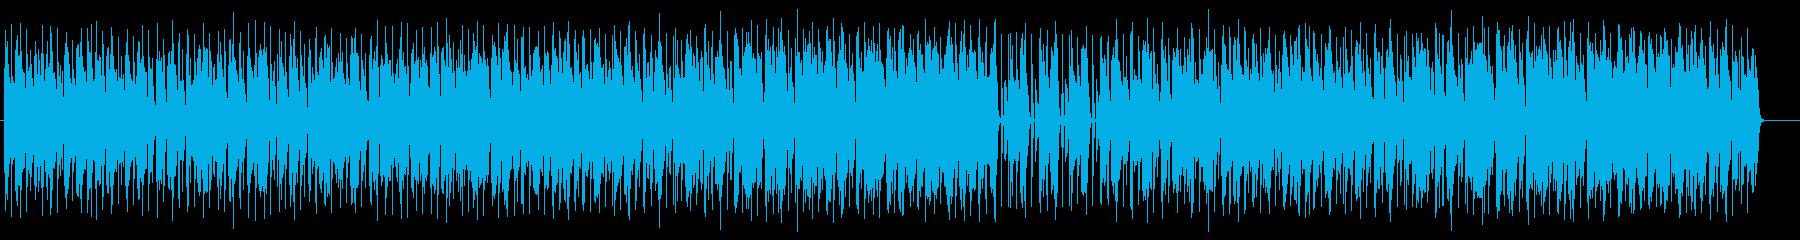 Techno-pop fantastic music's reproduced waveform